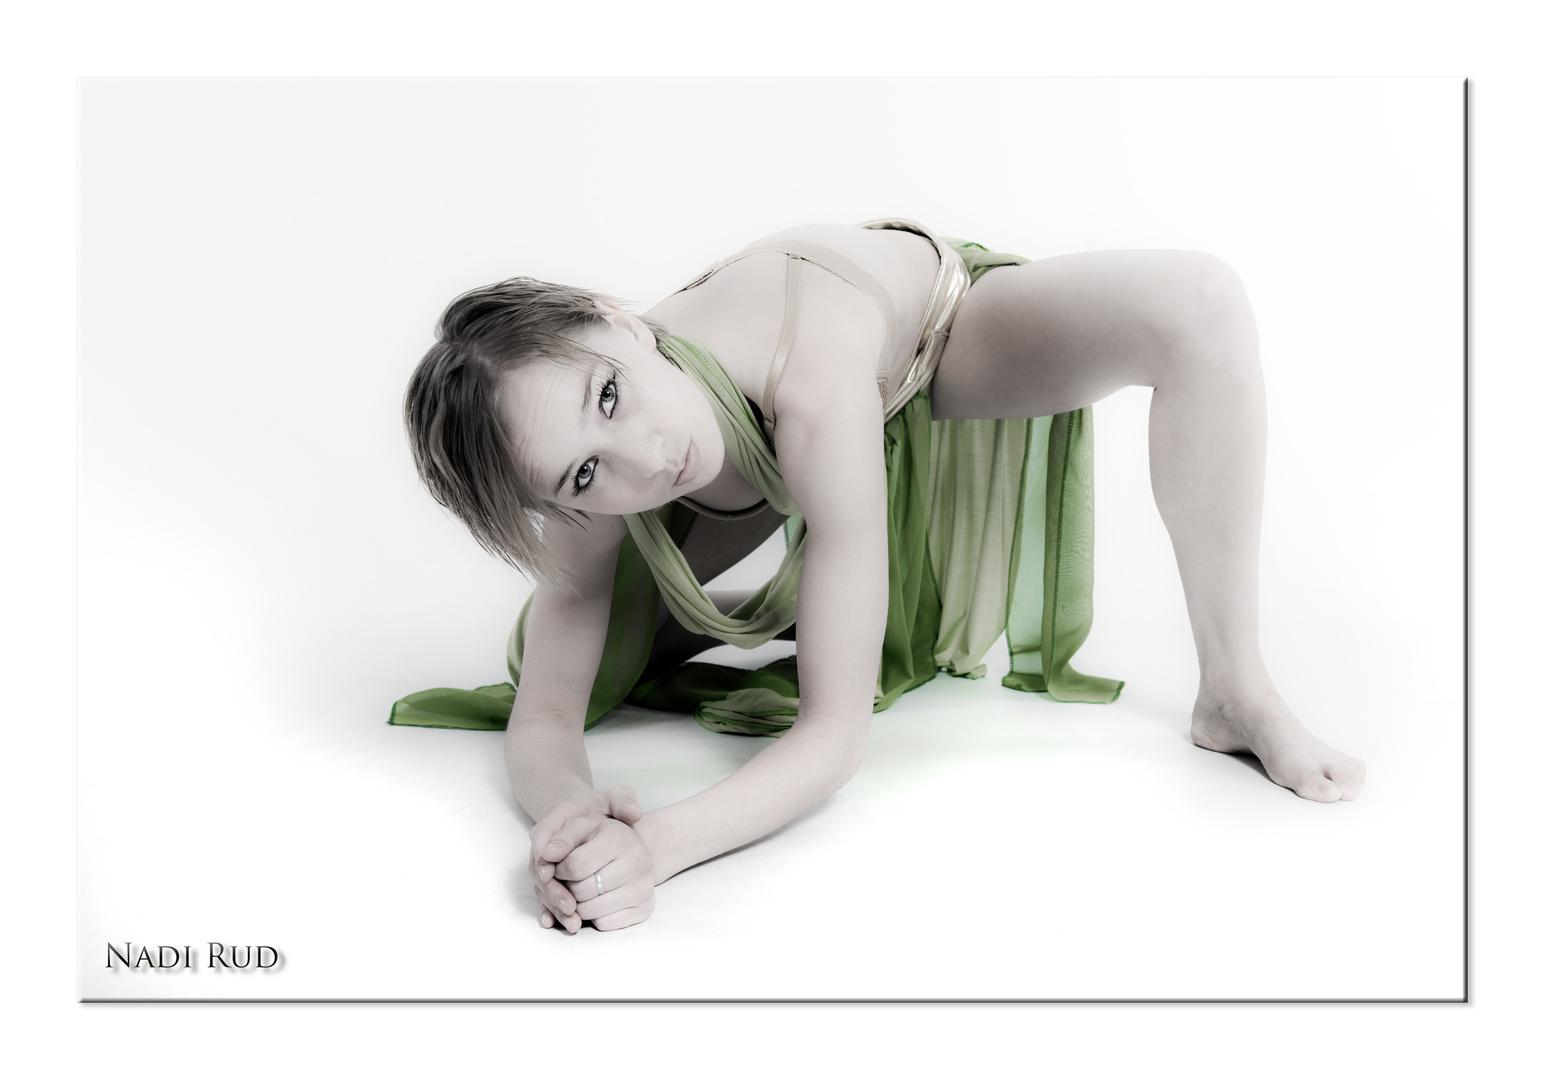 Nadi*** (Tanzkunst bei Forum Fotografie W.i.T.)